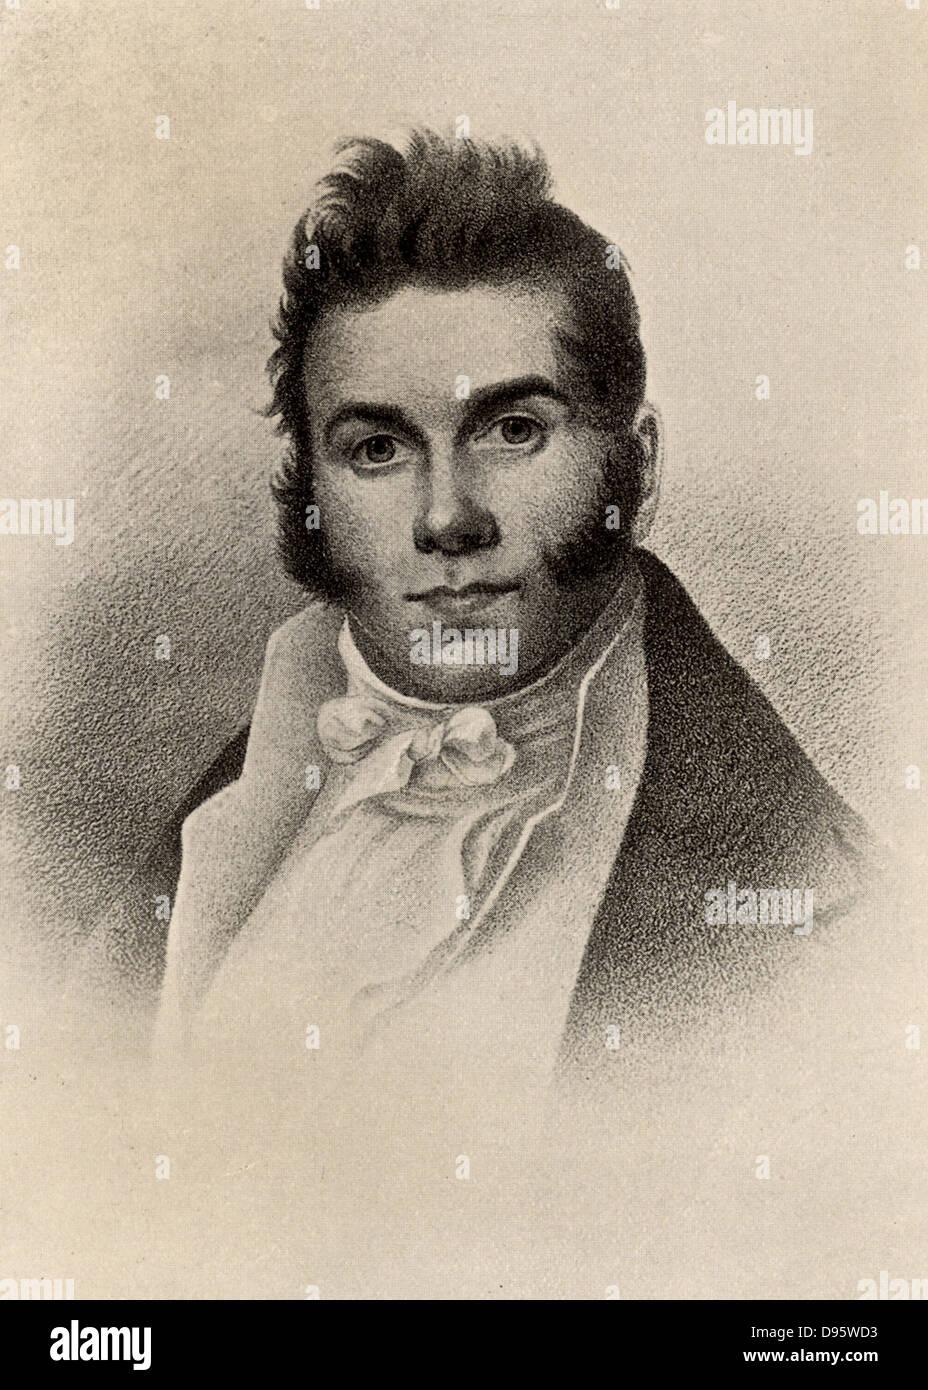 Thomas Say (1787-1834) American naturalist an entomologist. Halftone. - Stock Image